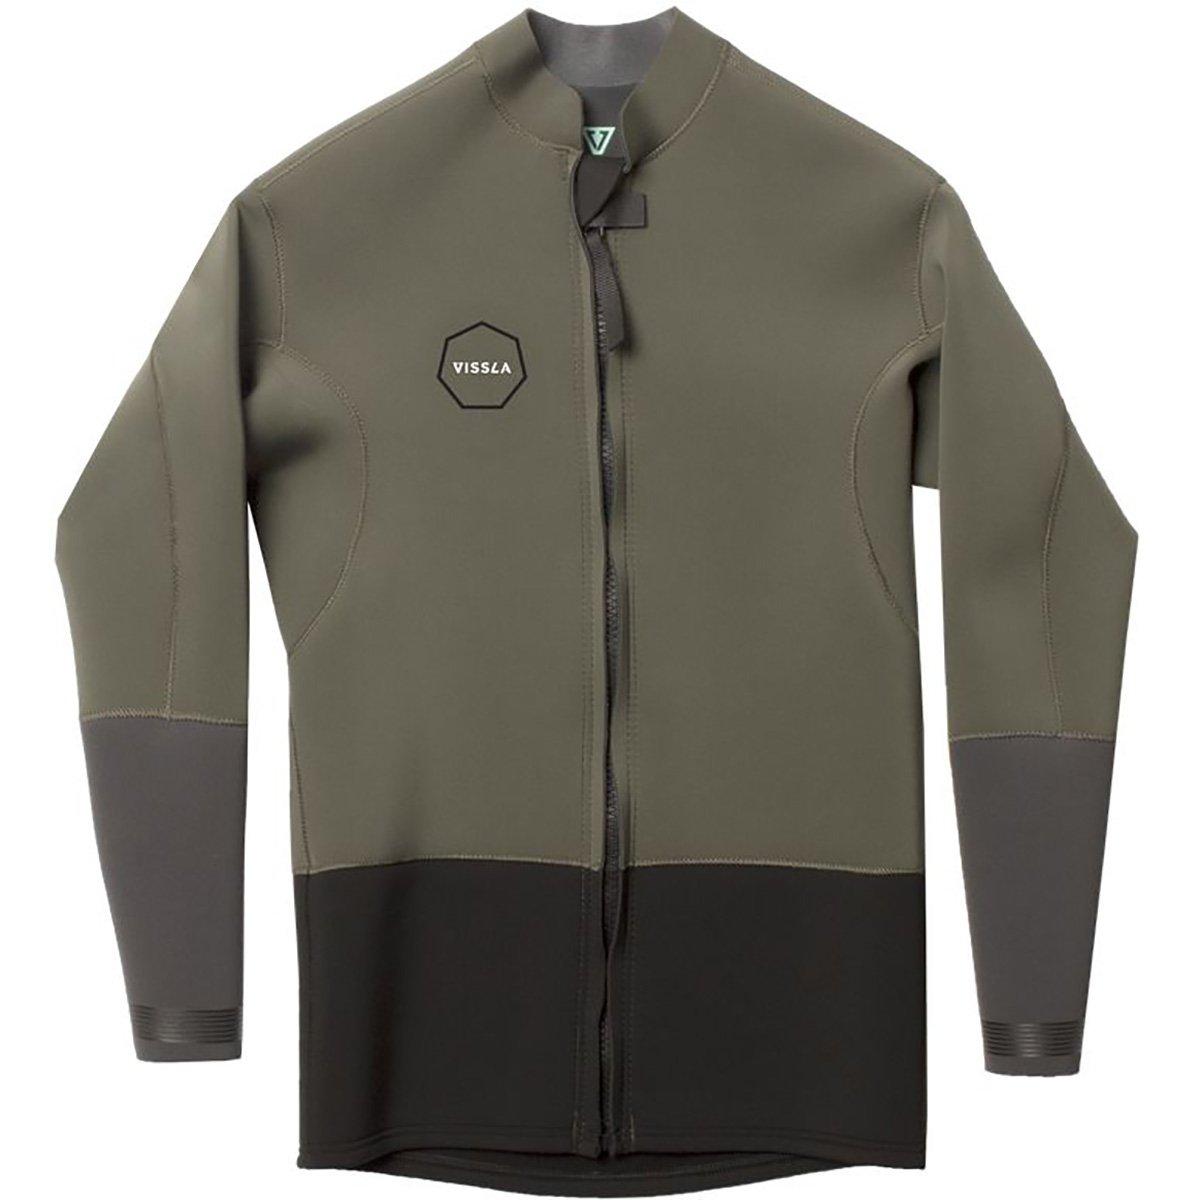 Vissla chaqueta de neopreno con cremallera delantera (2 mm ...